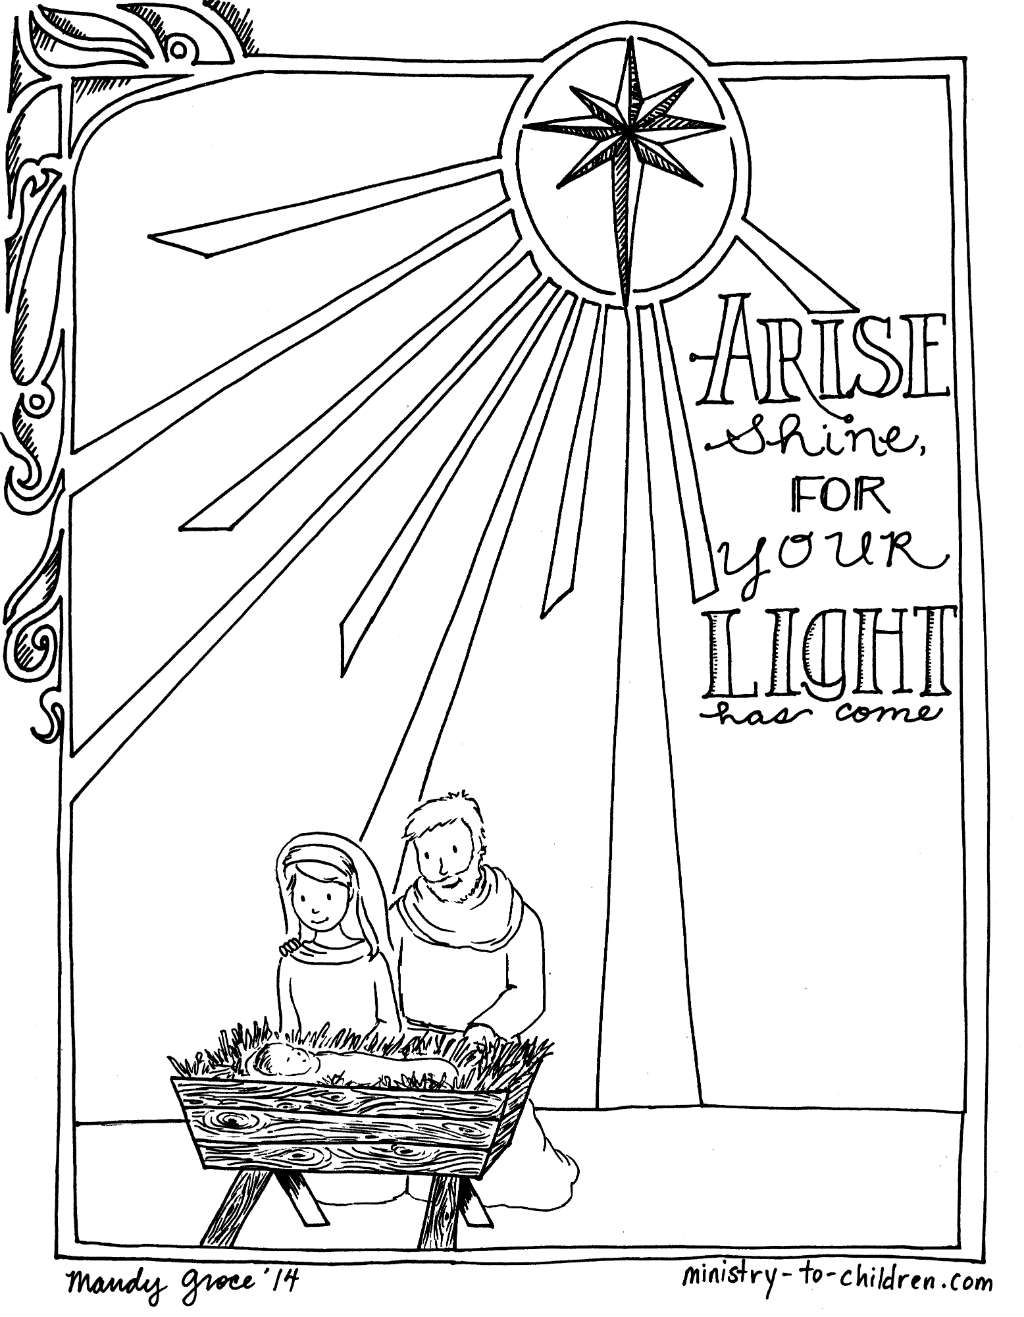 We Hope Your Children Will Enjoy This Nativity Scene